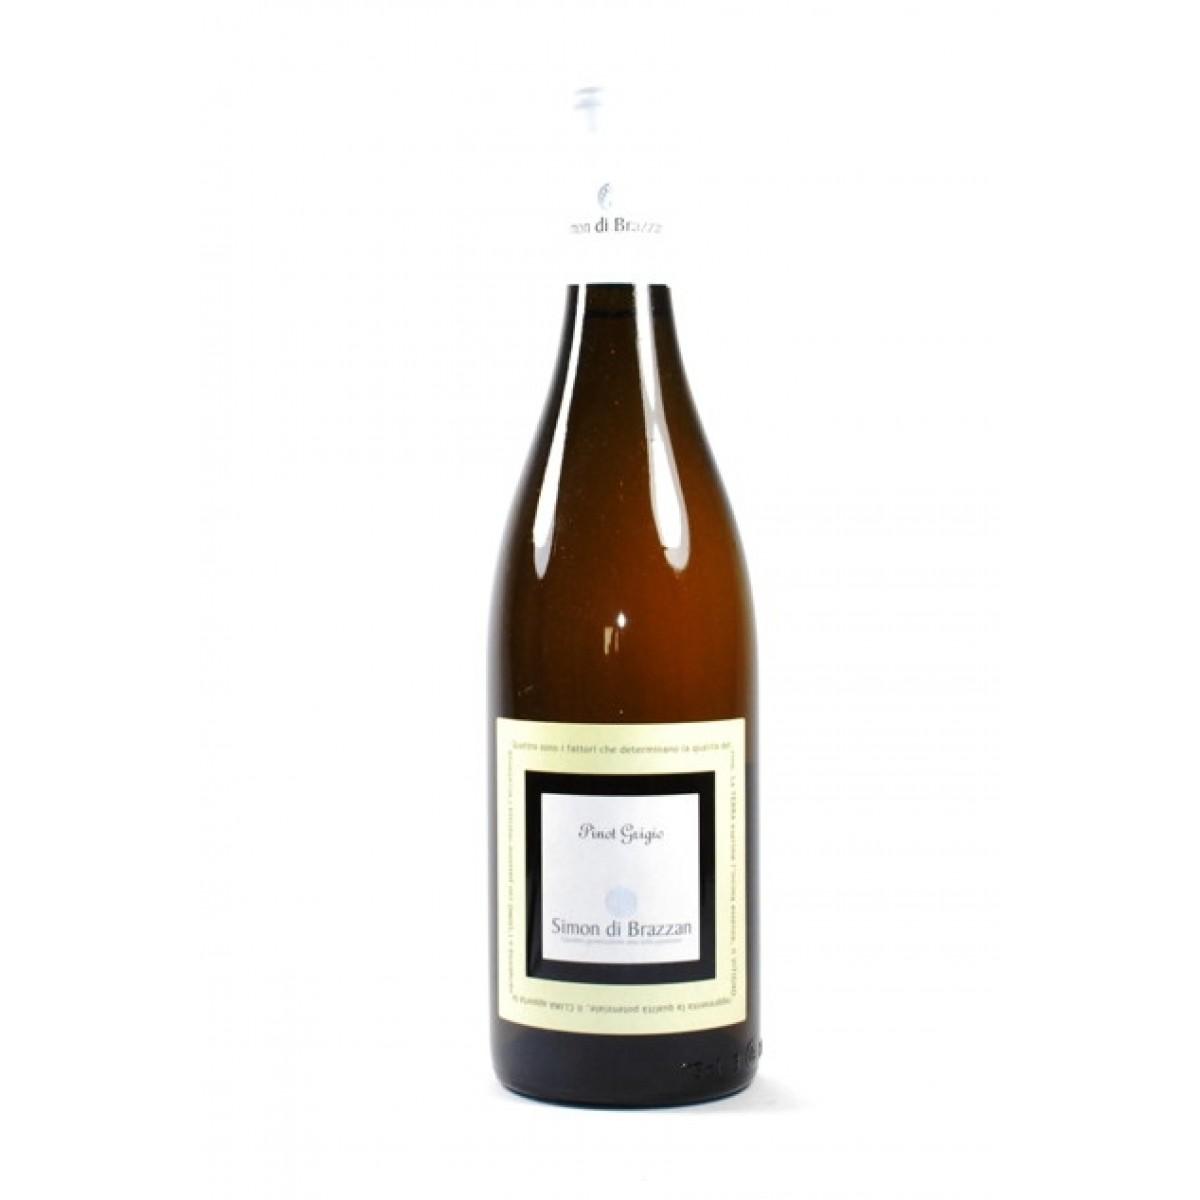 Vino bianco Pinot Grigio Friuli Venezia Giulia